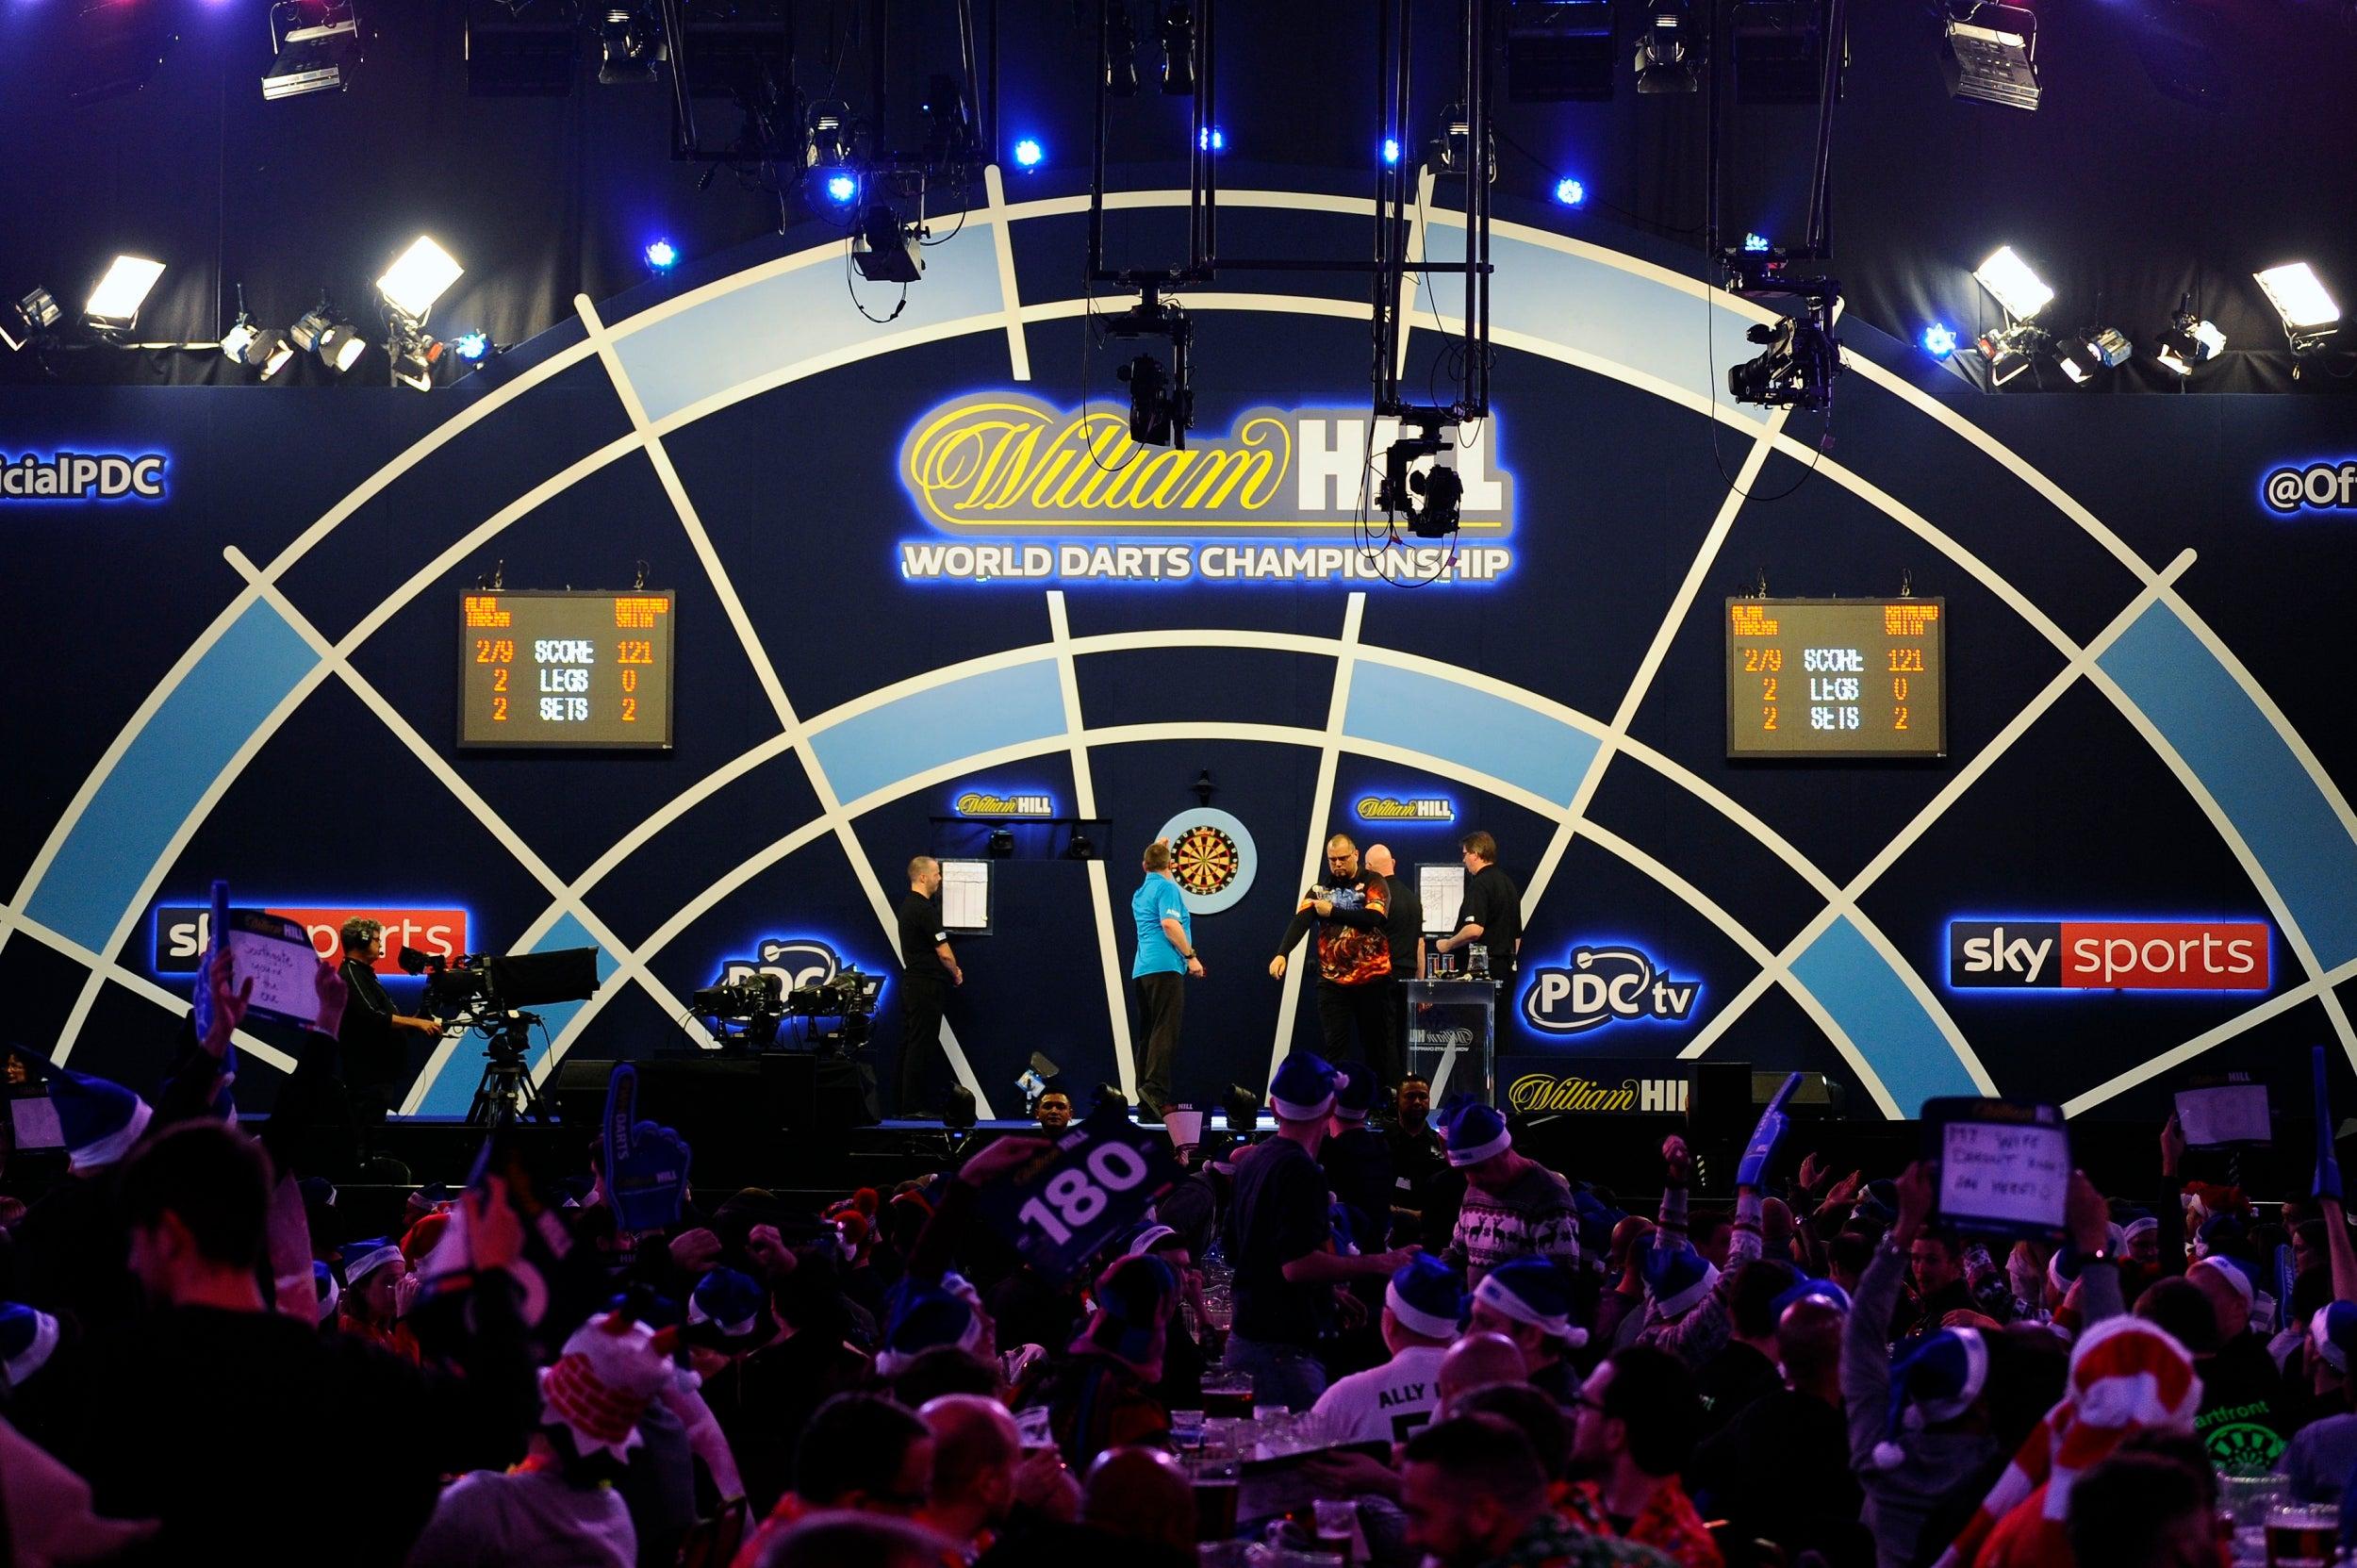 Darts World Championship: Michael van Gerwen and Gary